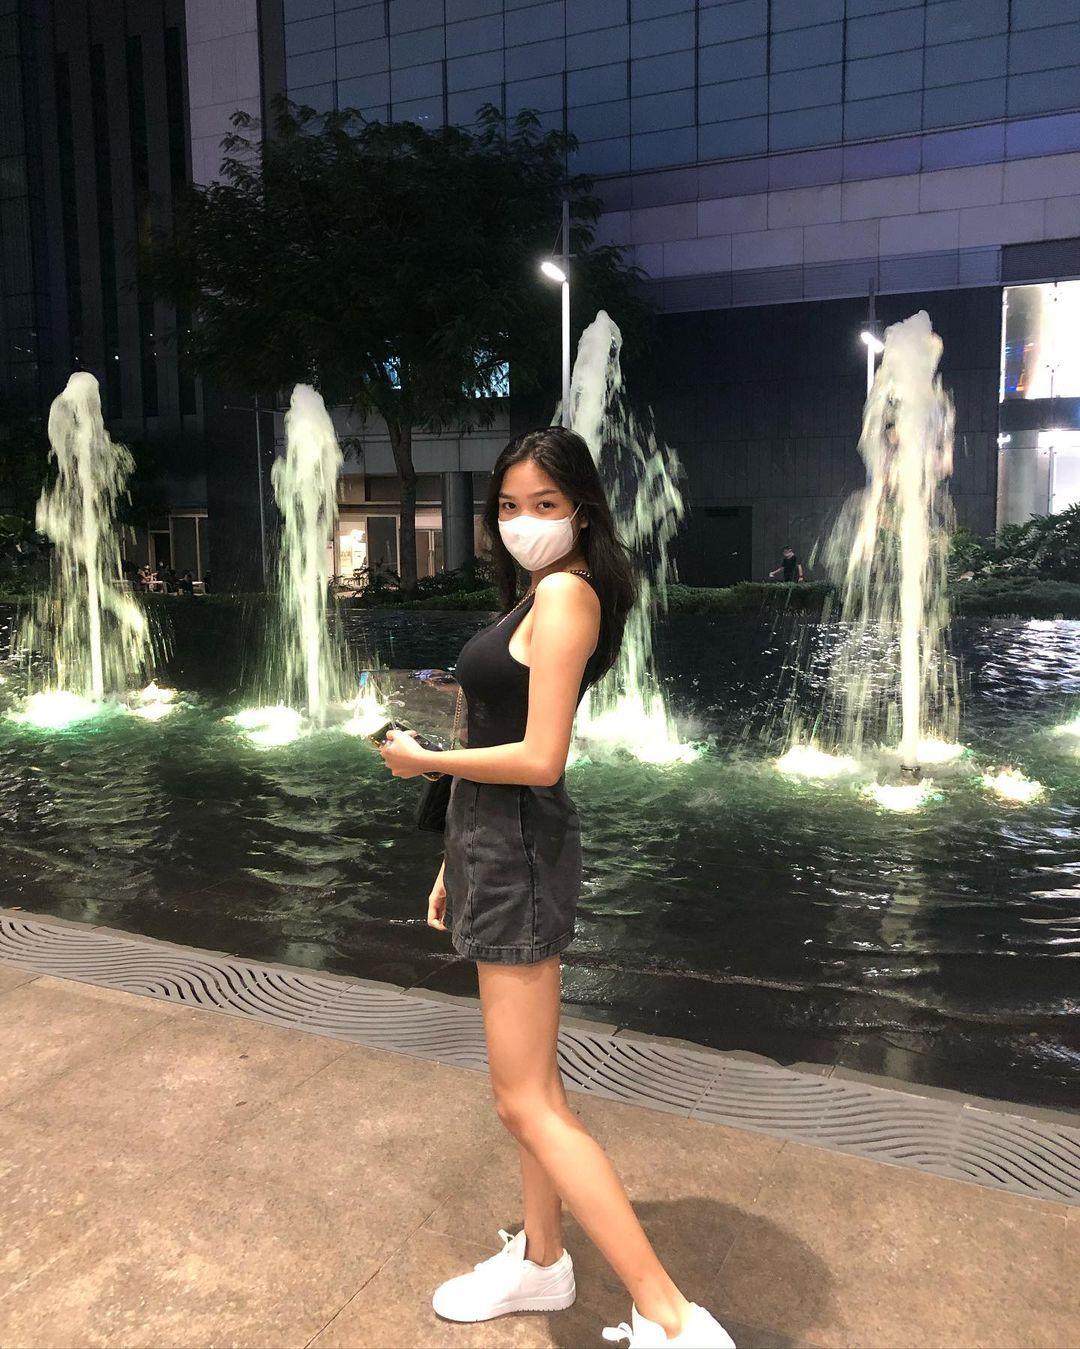 Nina stephanie guerrero posing tall on Instagram